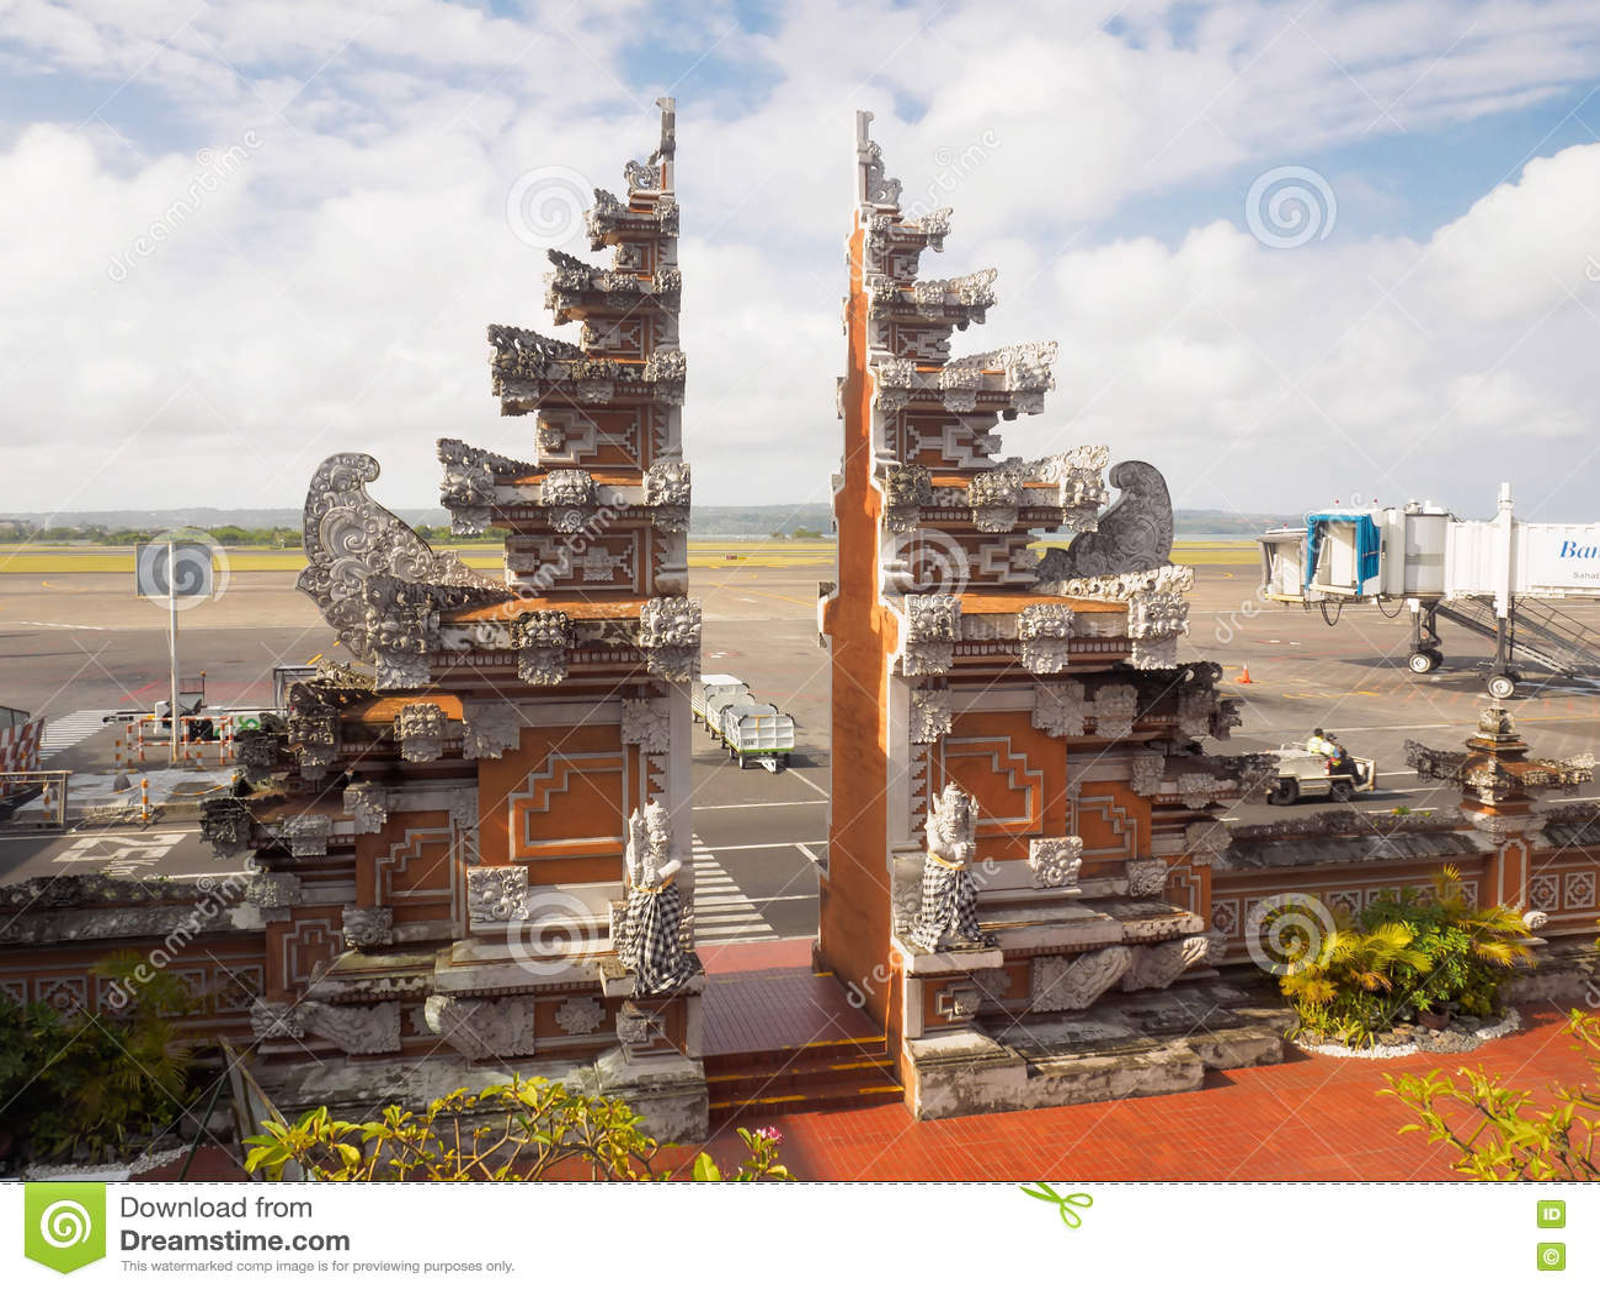 Aeroporto Bali : Bali international airport bali indonesia stock photos images